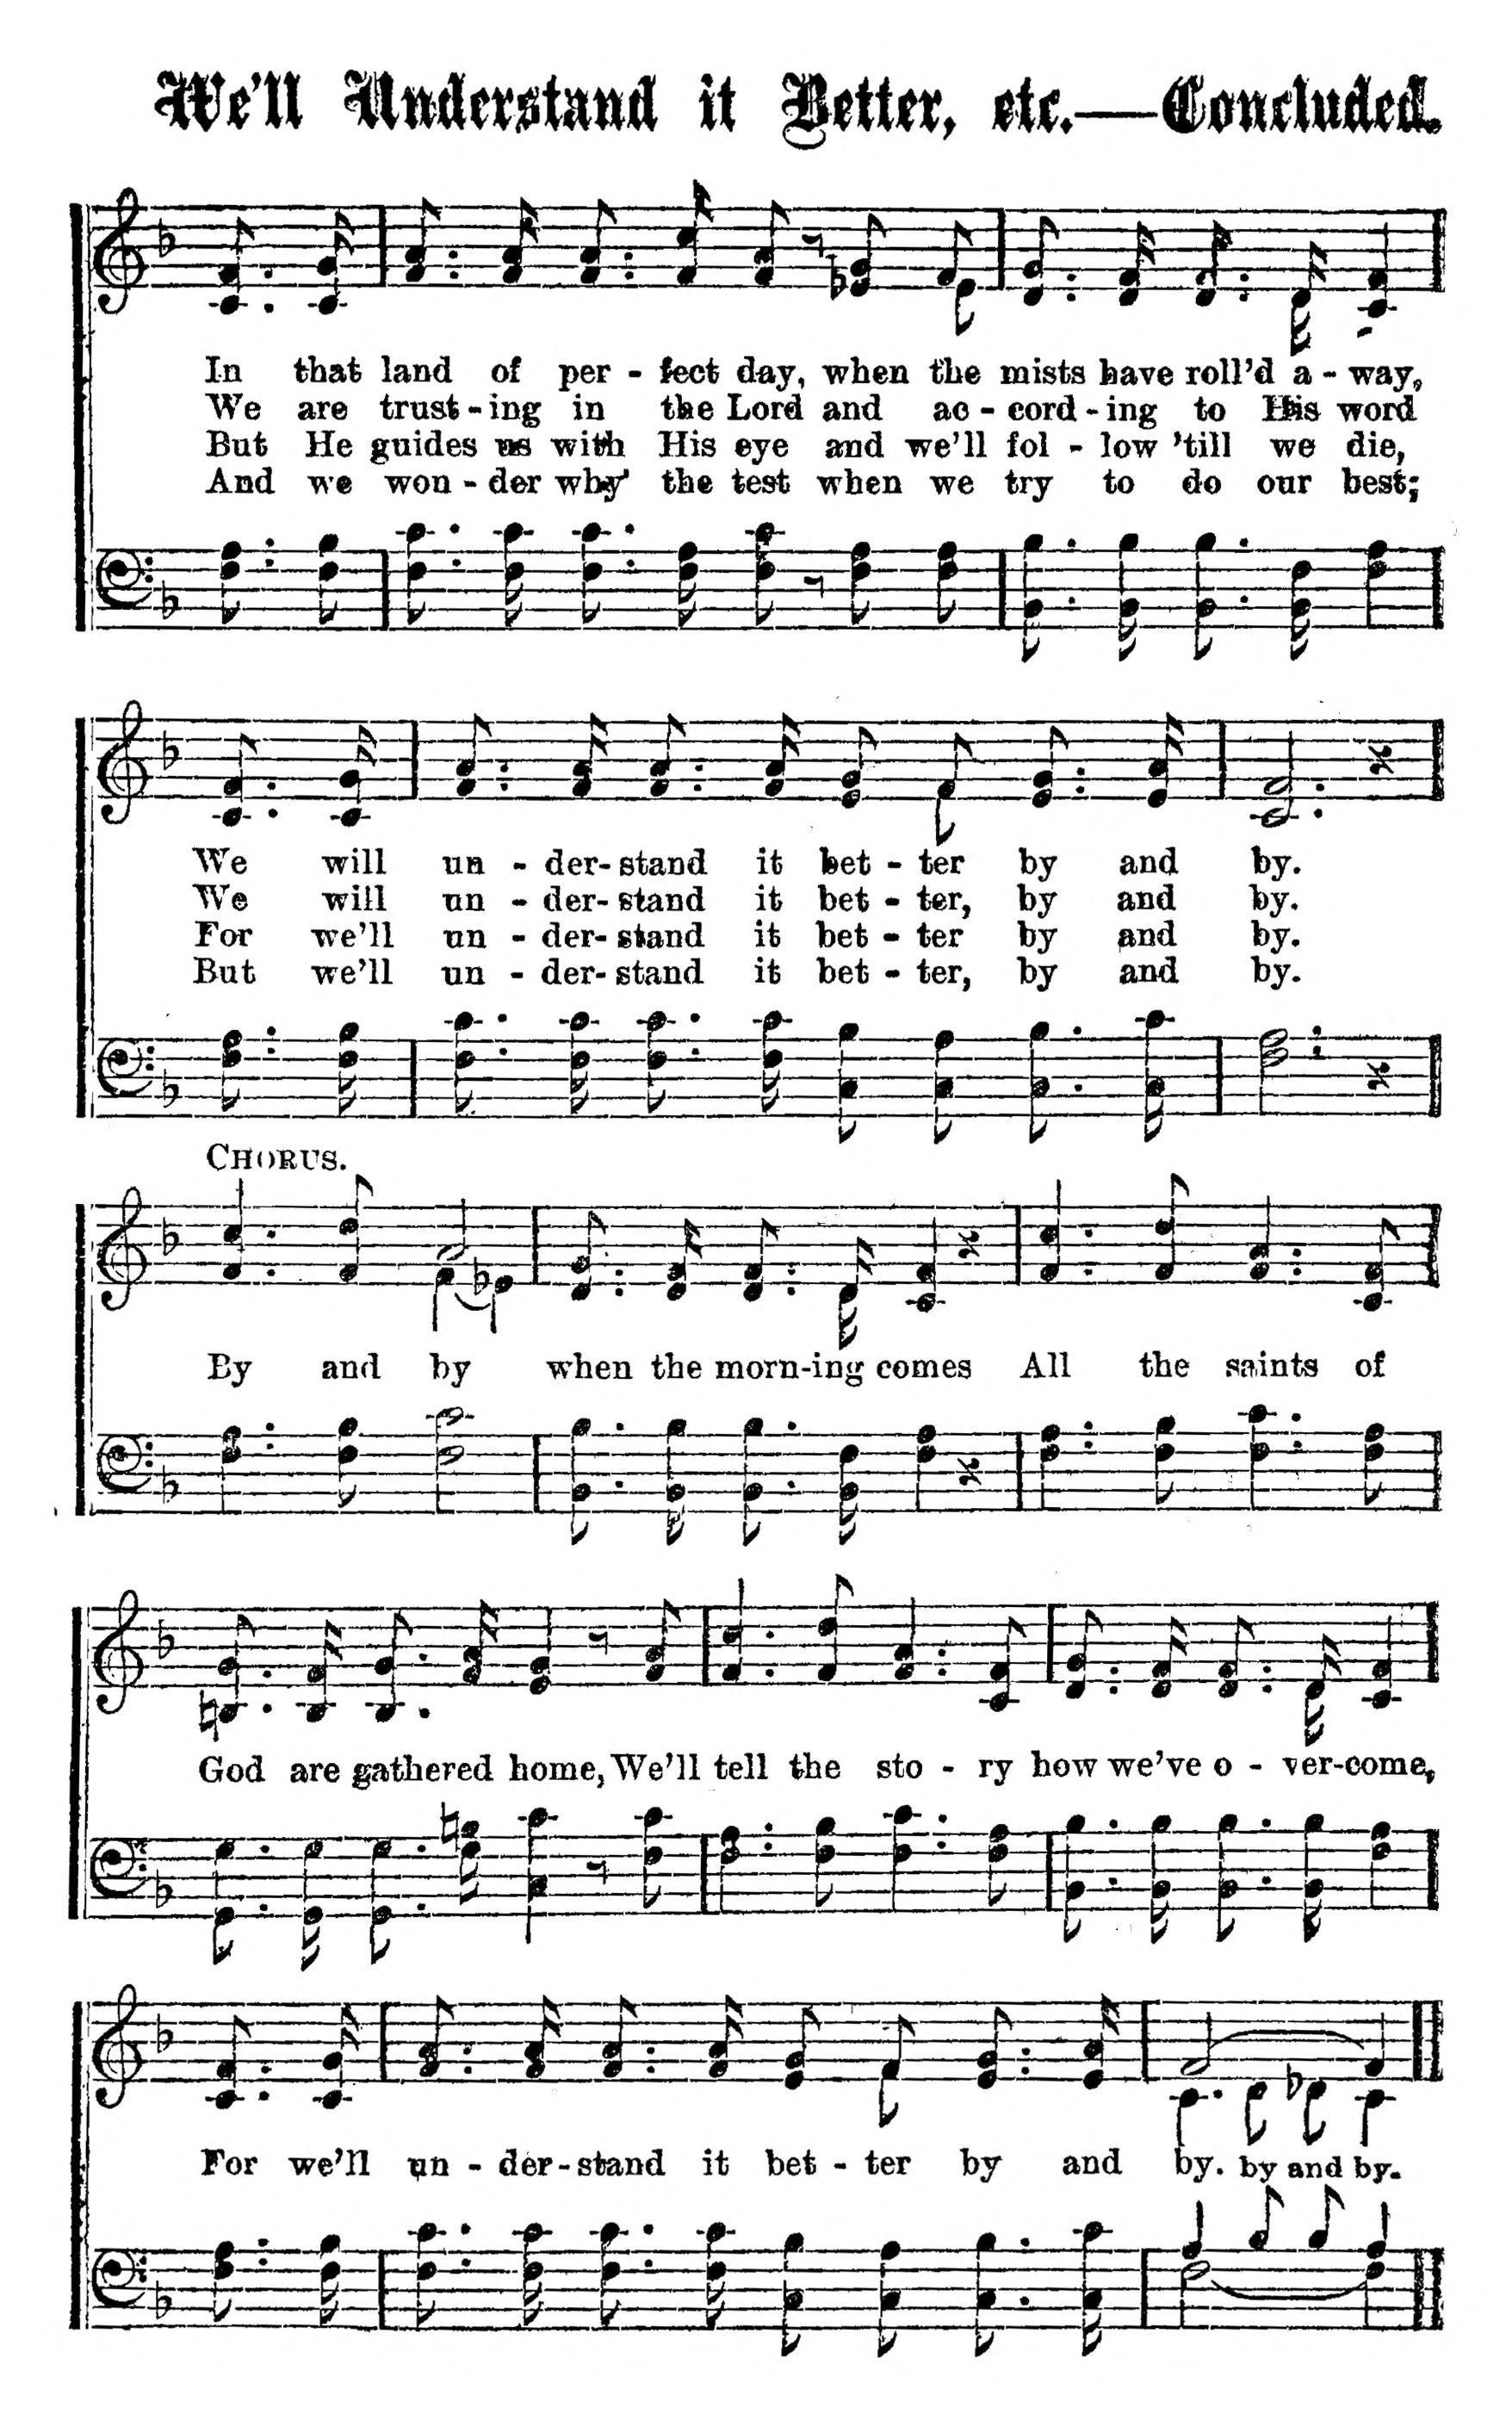 Fig. 1.   Soul Echoes , No. 2 (Philadelphia: Soul Echoes Publishing Co., 1909).